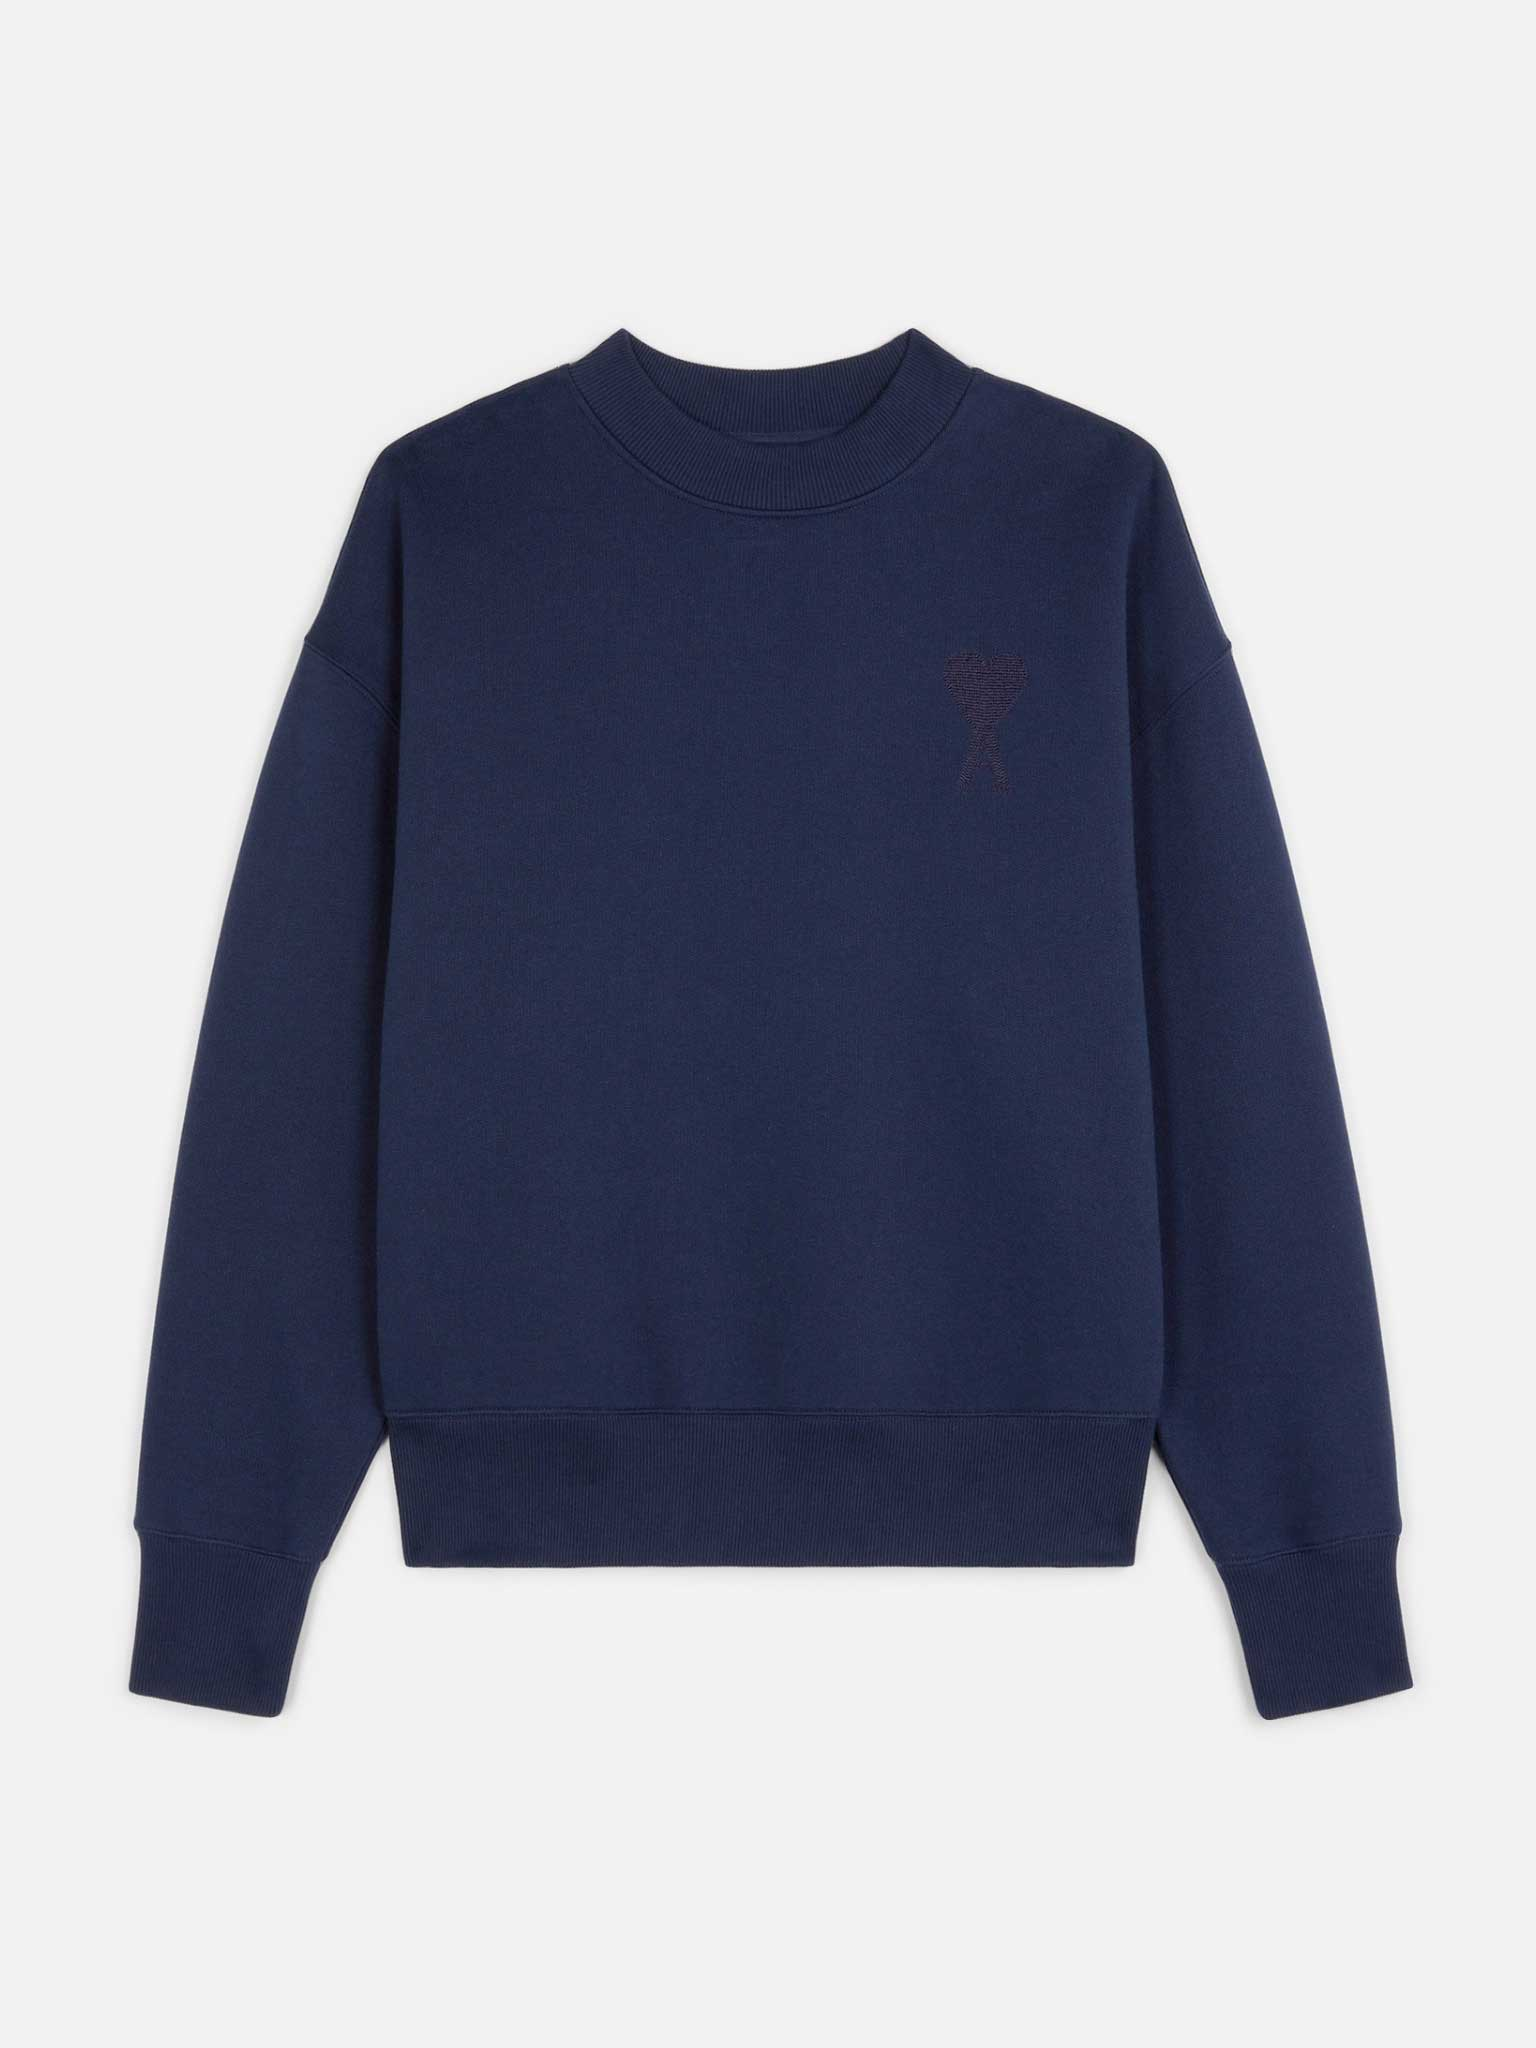 RUBY_AMI_ADC_big_Sweater_navy01